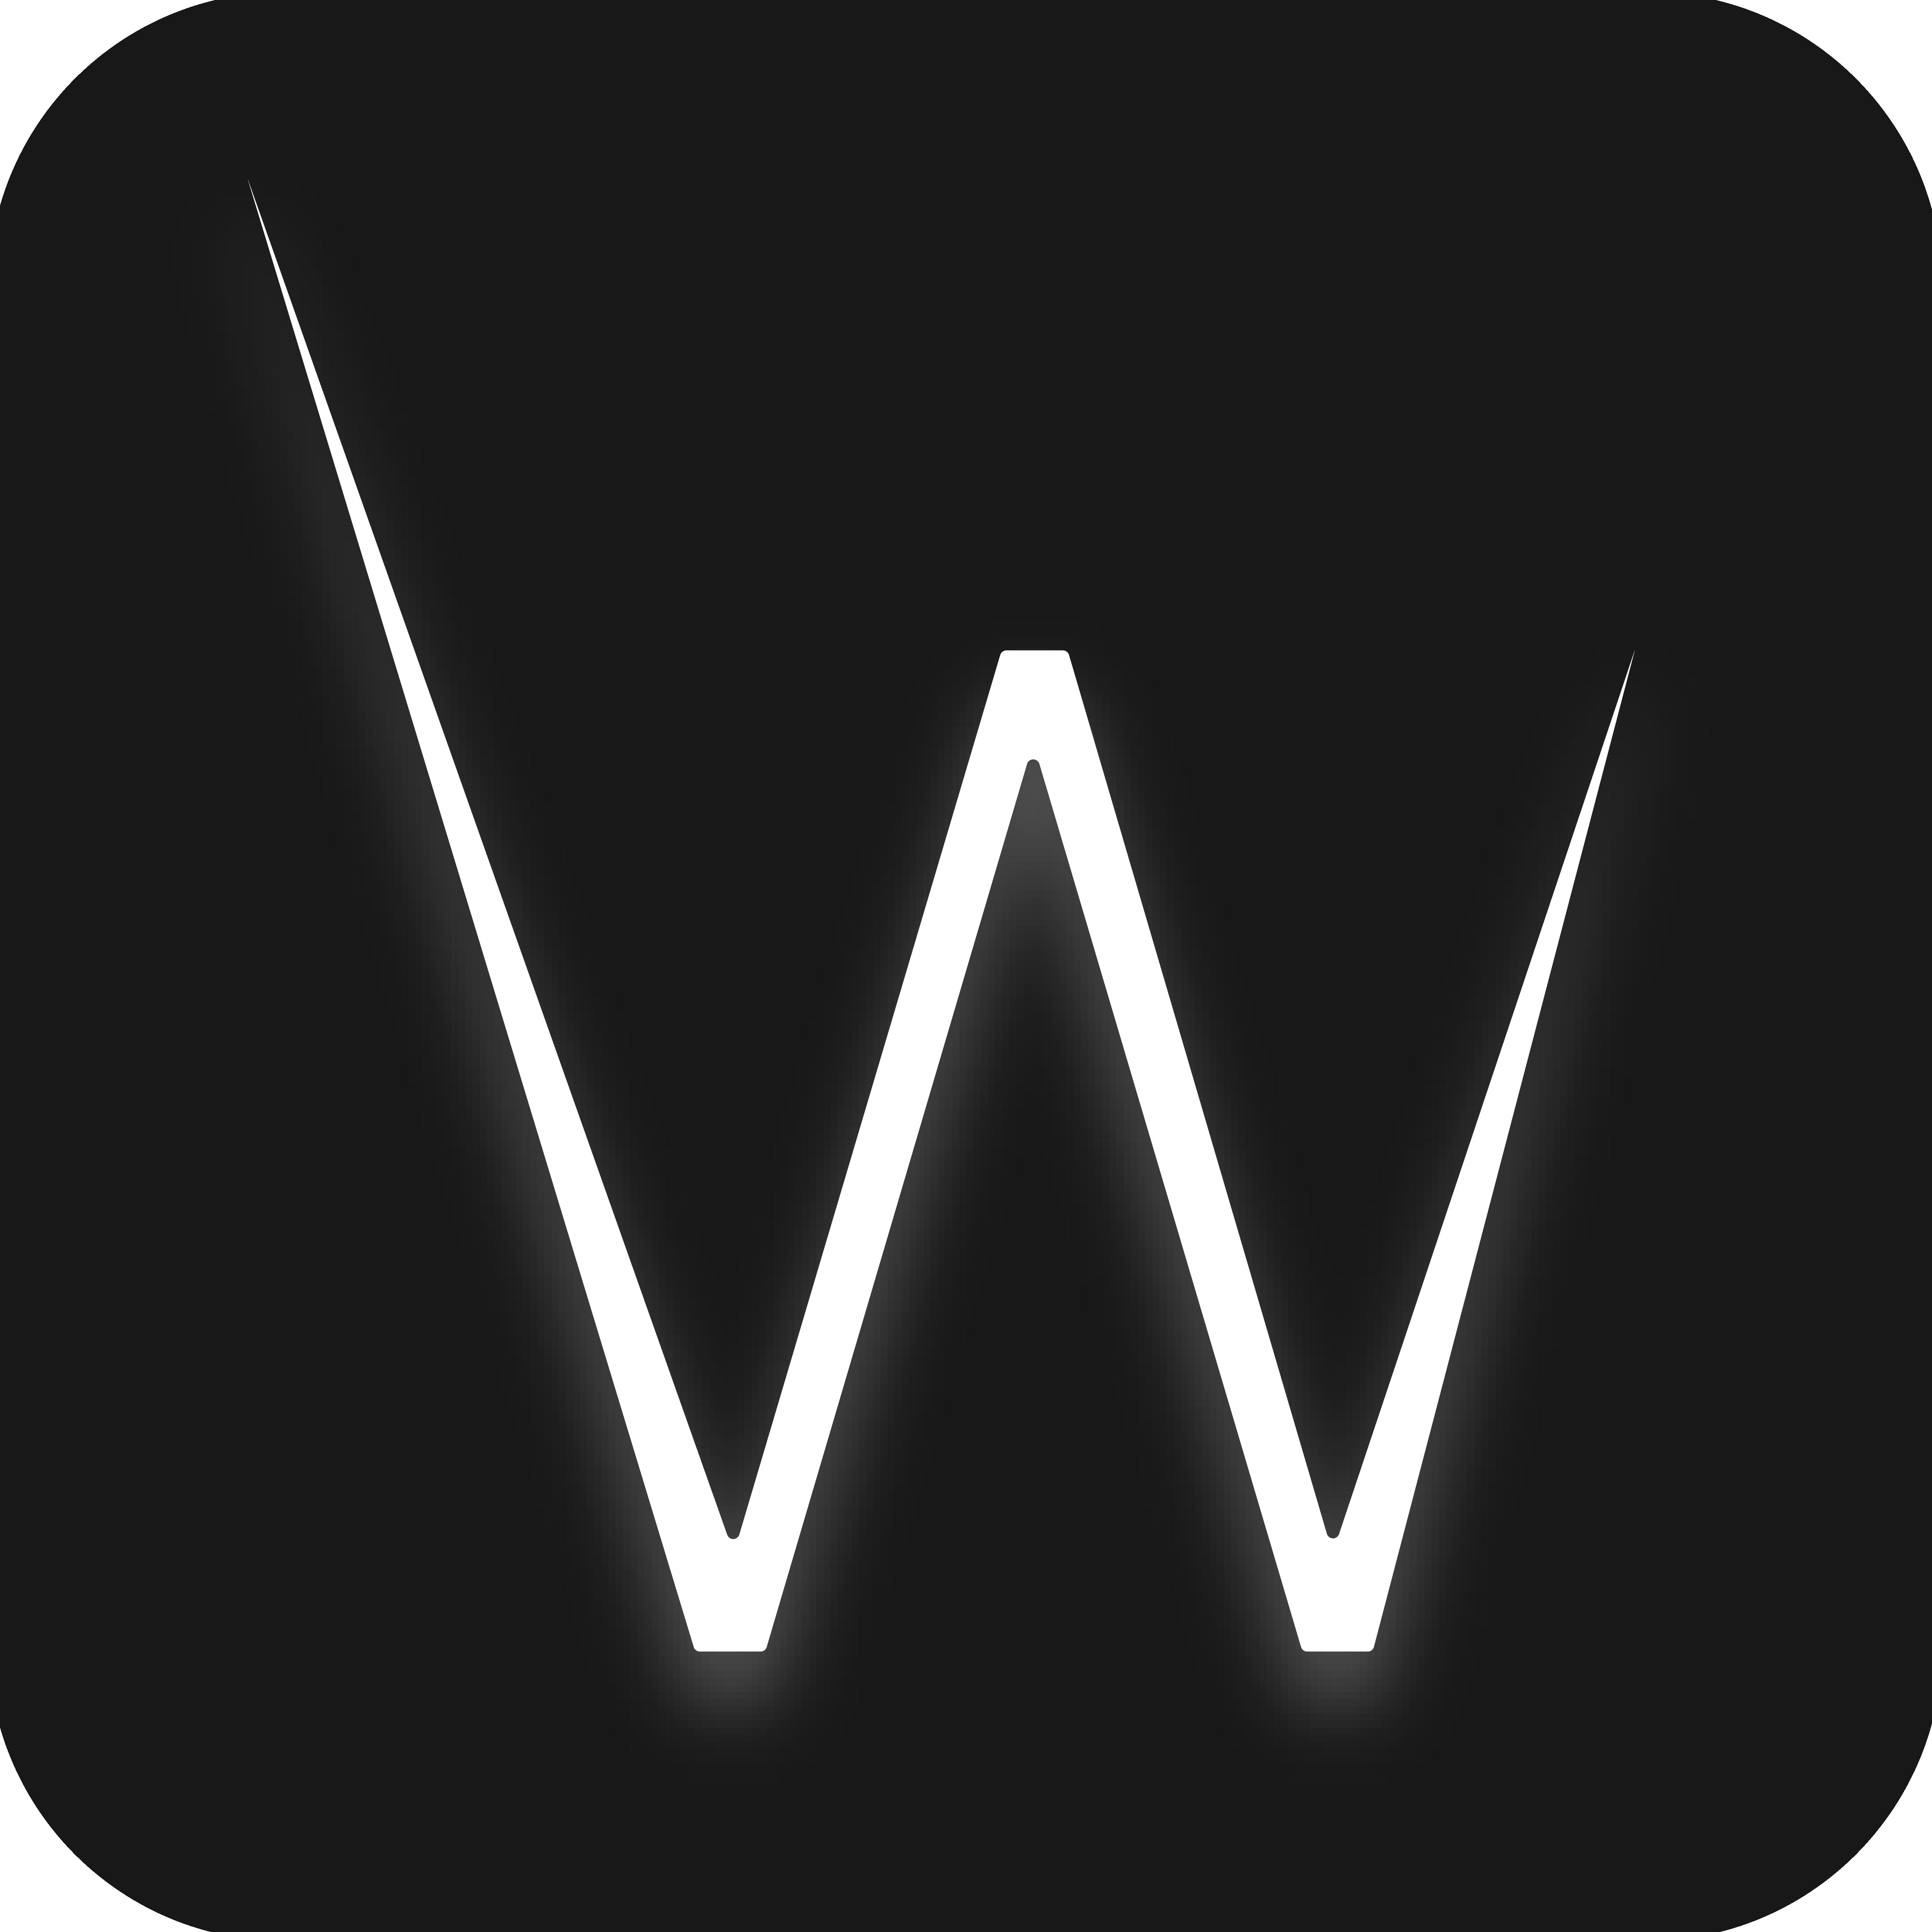 Webfluencer logo